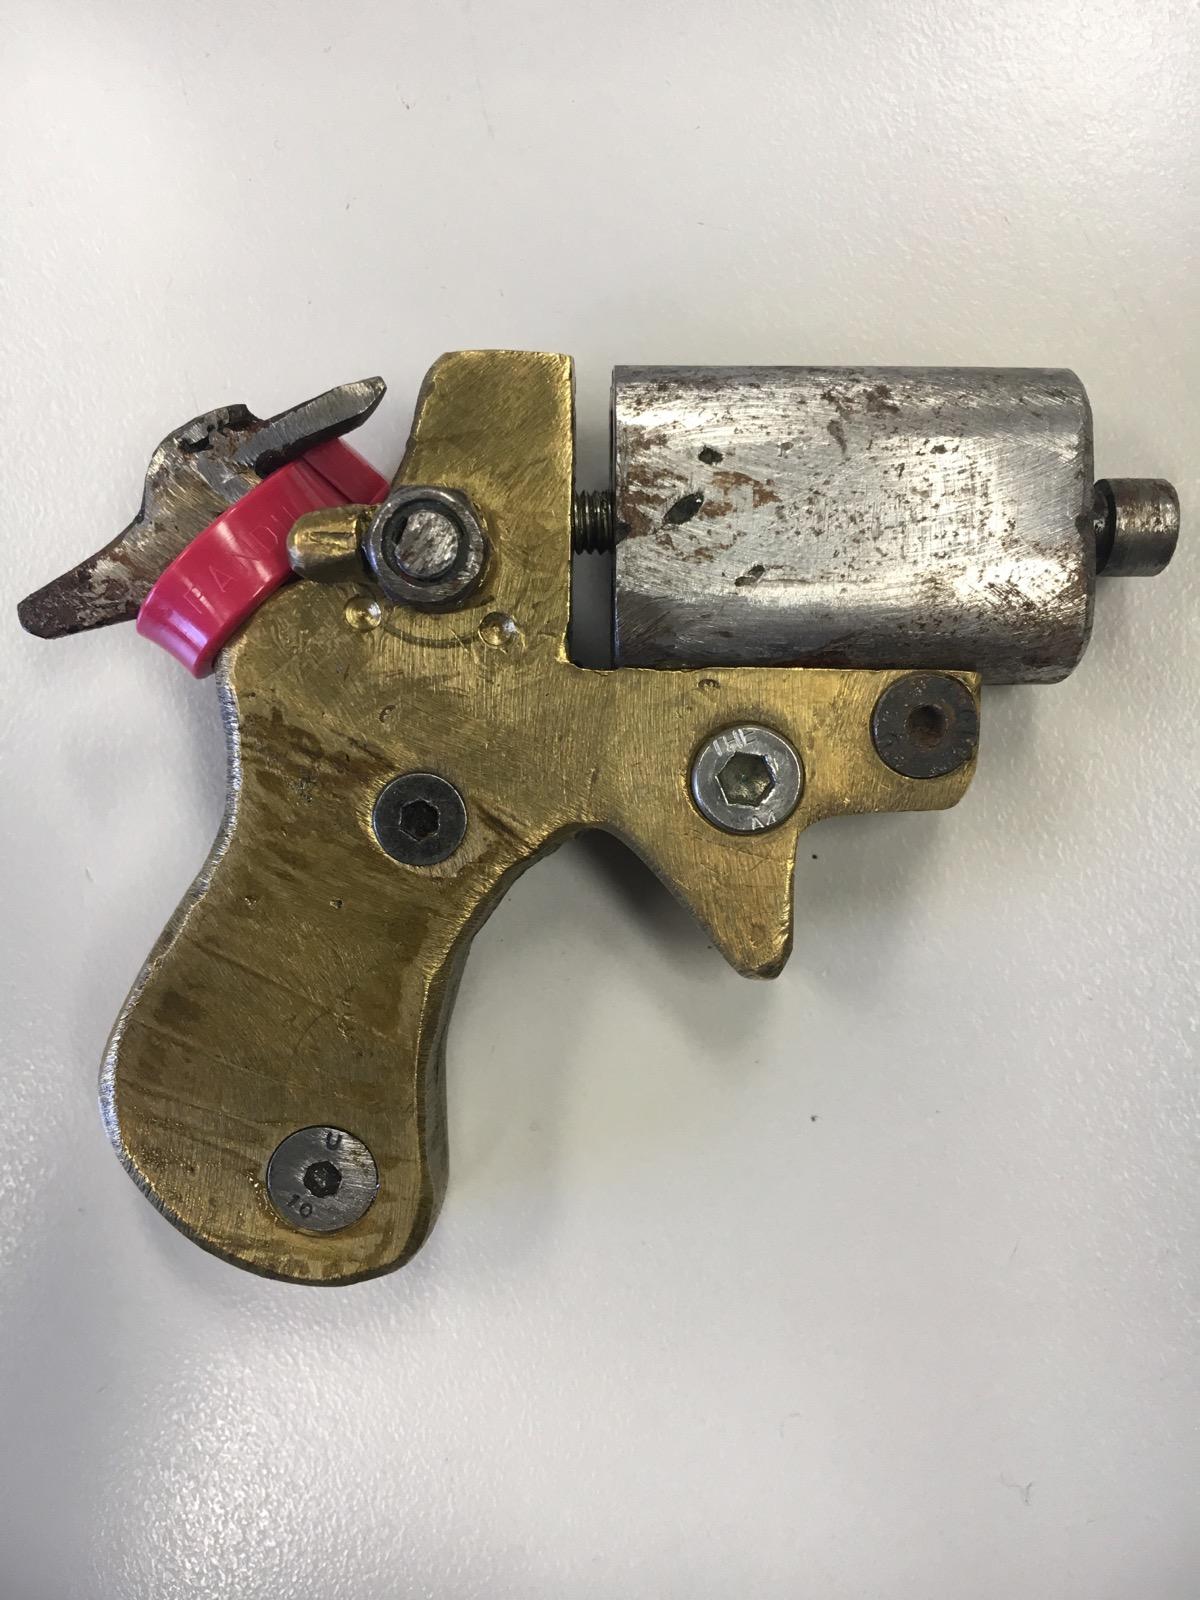 Homemade double barrel derringer seized by Australian police   Impro